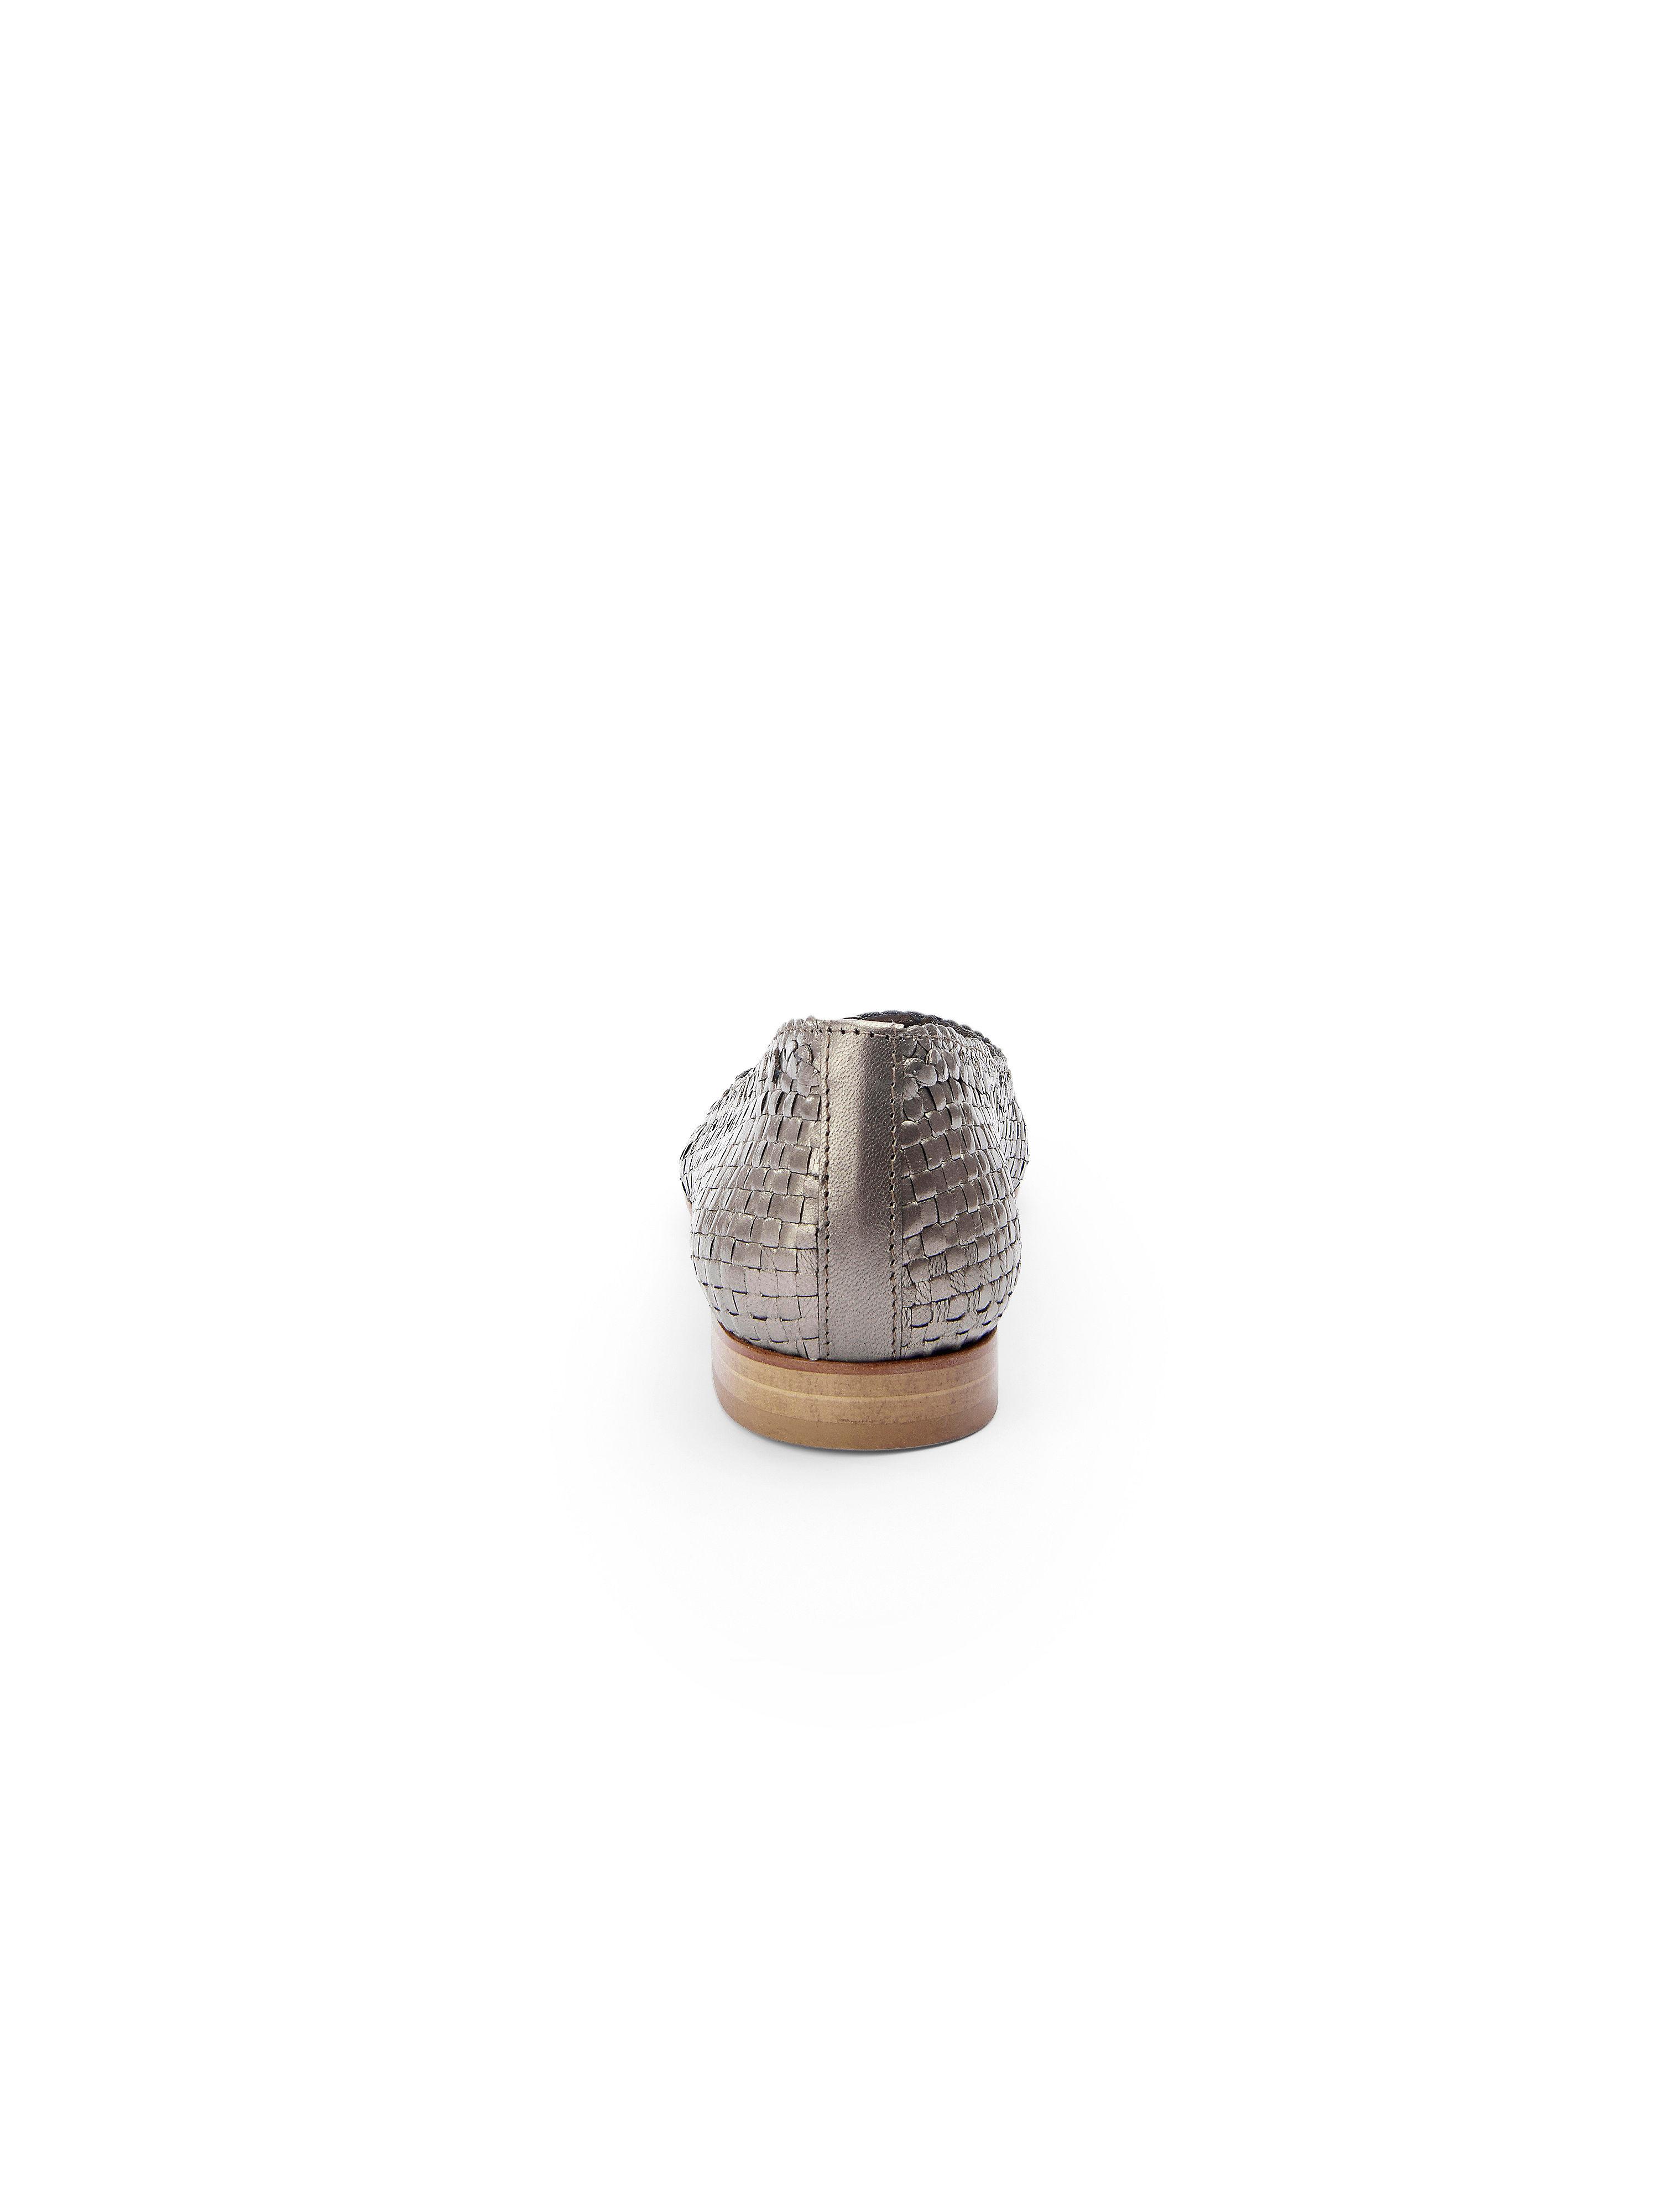 Scarpio - Ballerina beliebte - Bronze/Metallic Gute Qualität beliebte Ballerina Schuhe 4bcd23